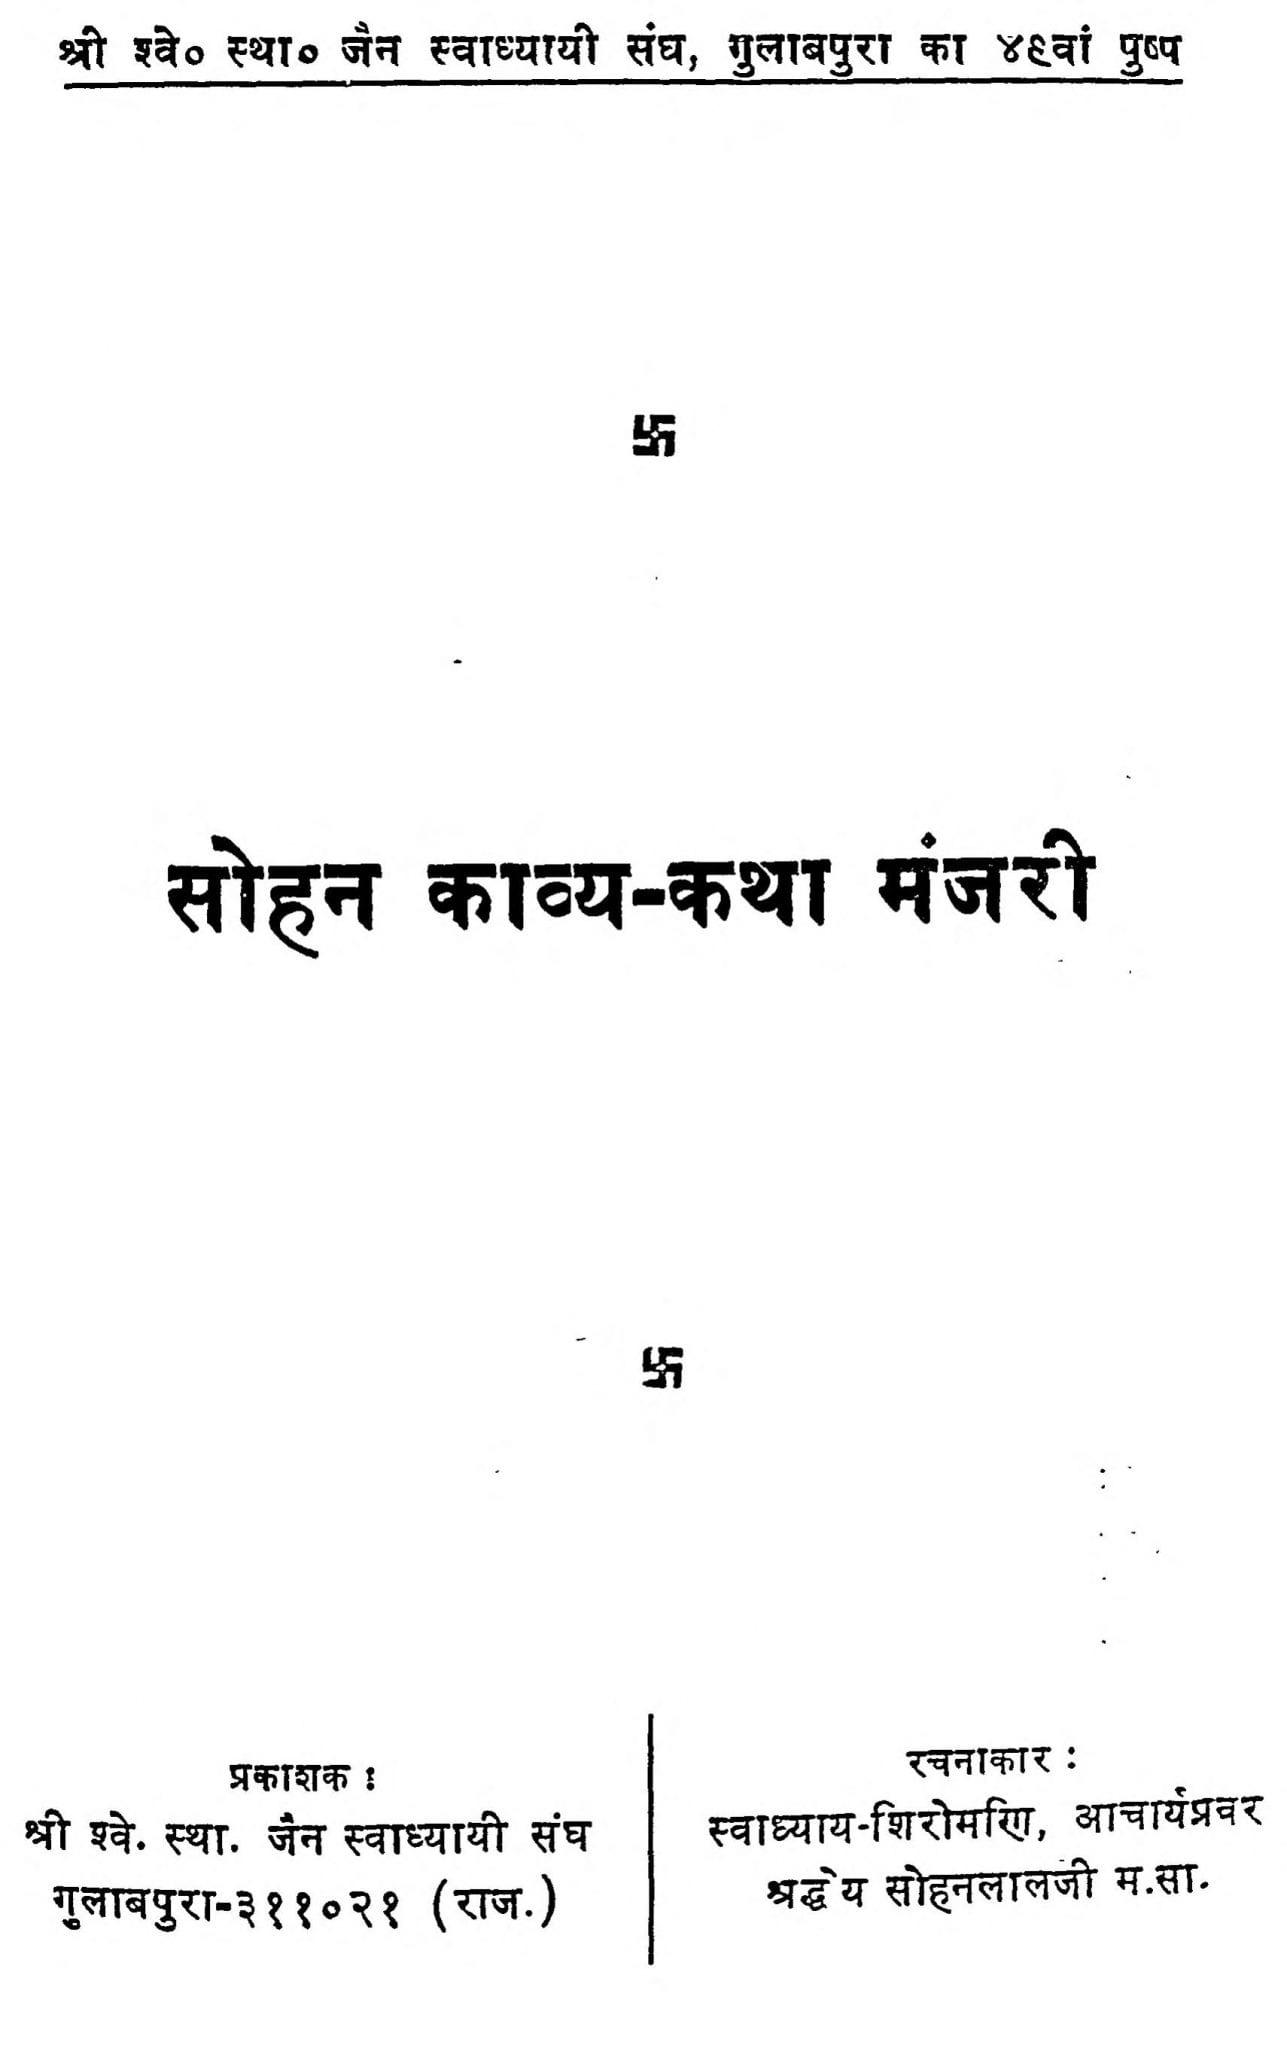 Sohan Kavya Katha Manjari by श्री वल्लबमुनिजी - Shree Vallabmunijee